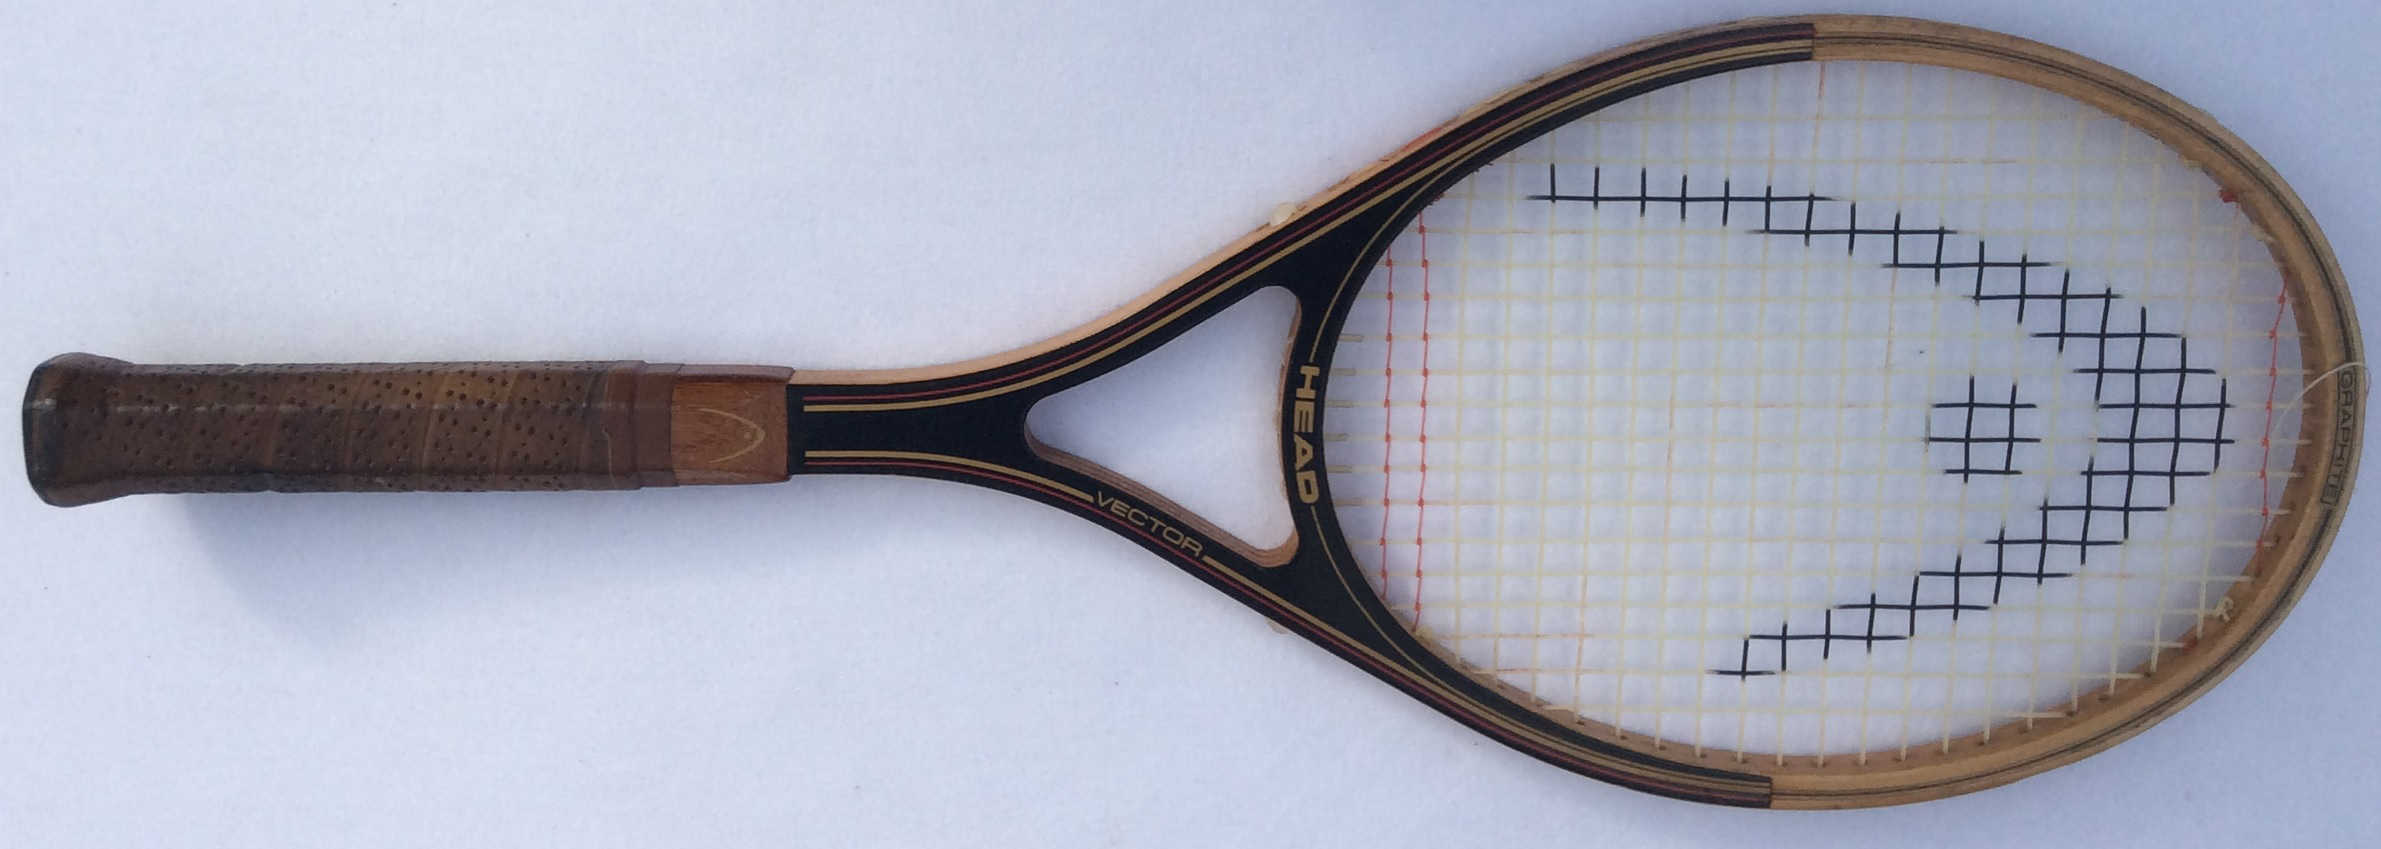 7a37426ea5 Jim's Tennis - Rackets 1980s - 2000s